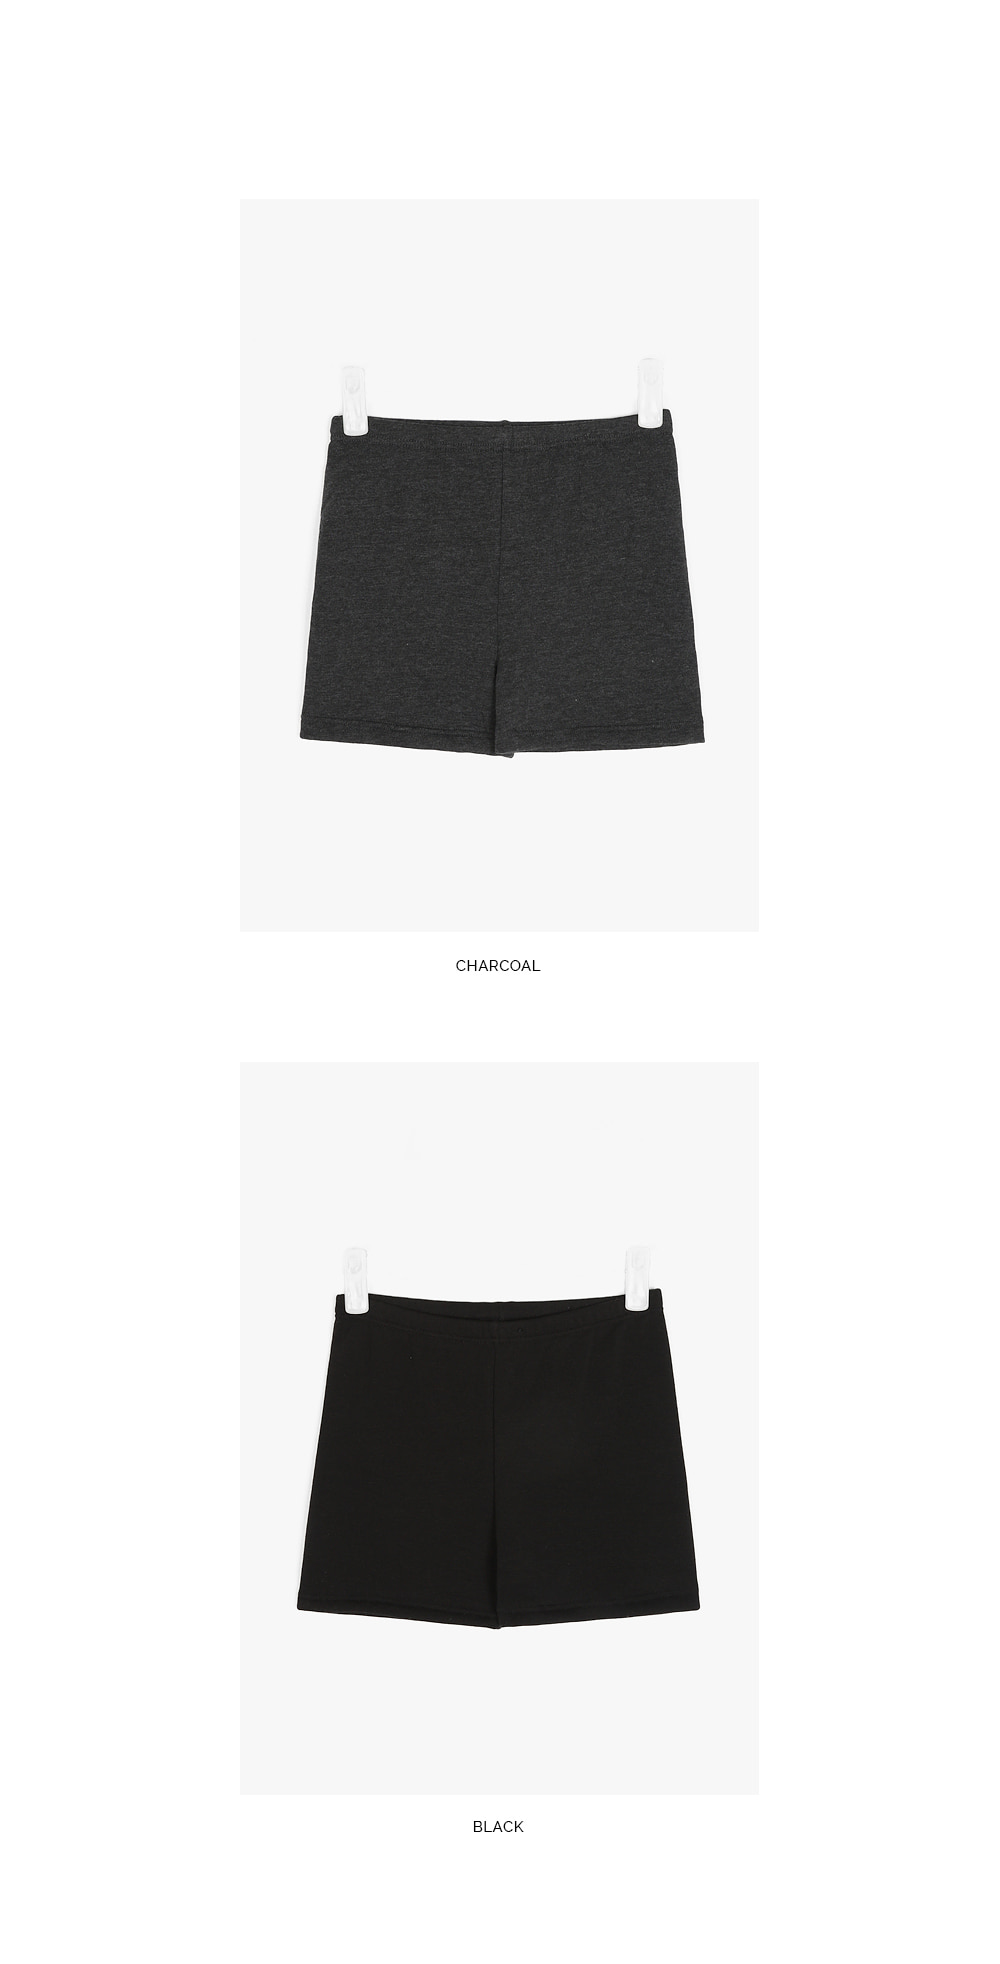 warm inner shorts